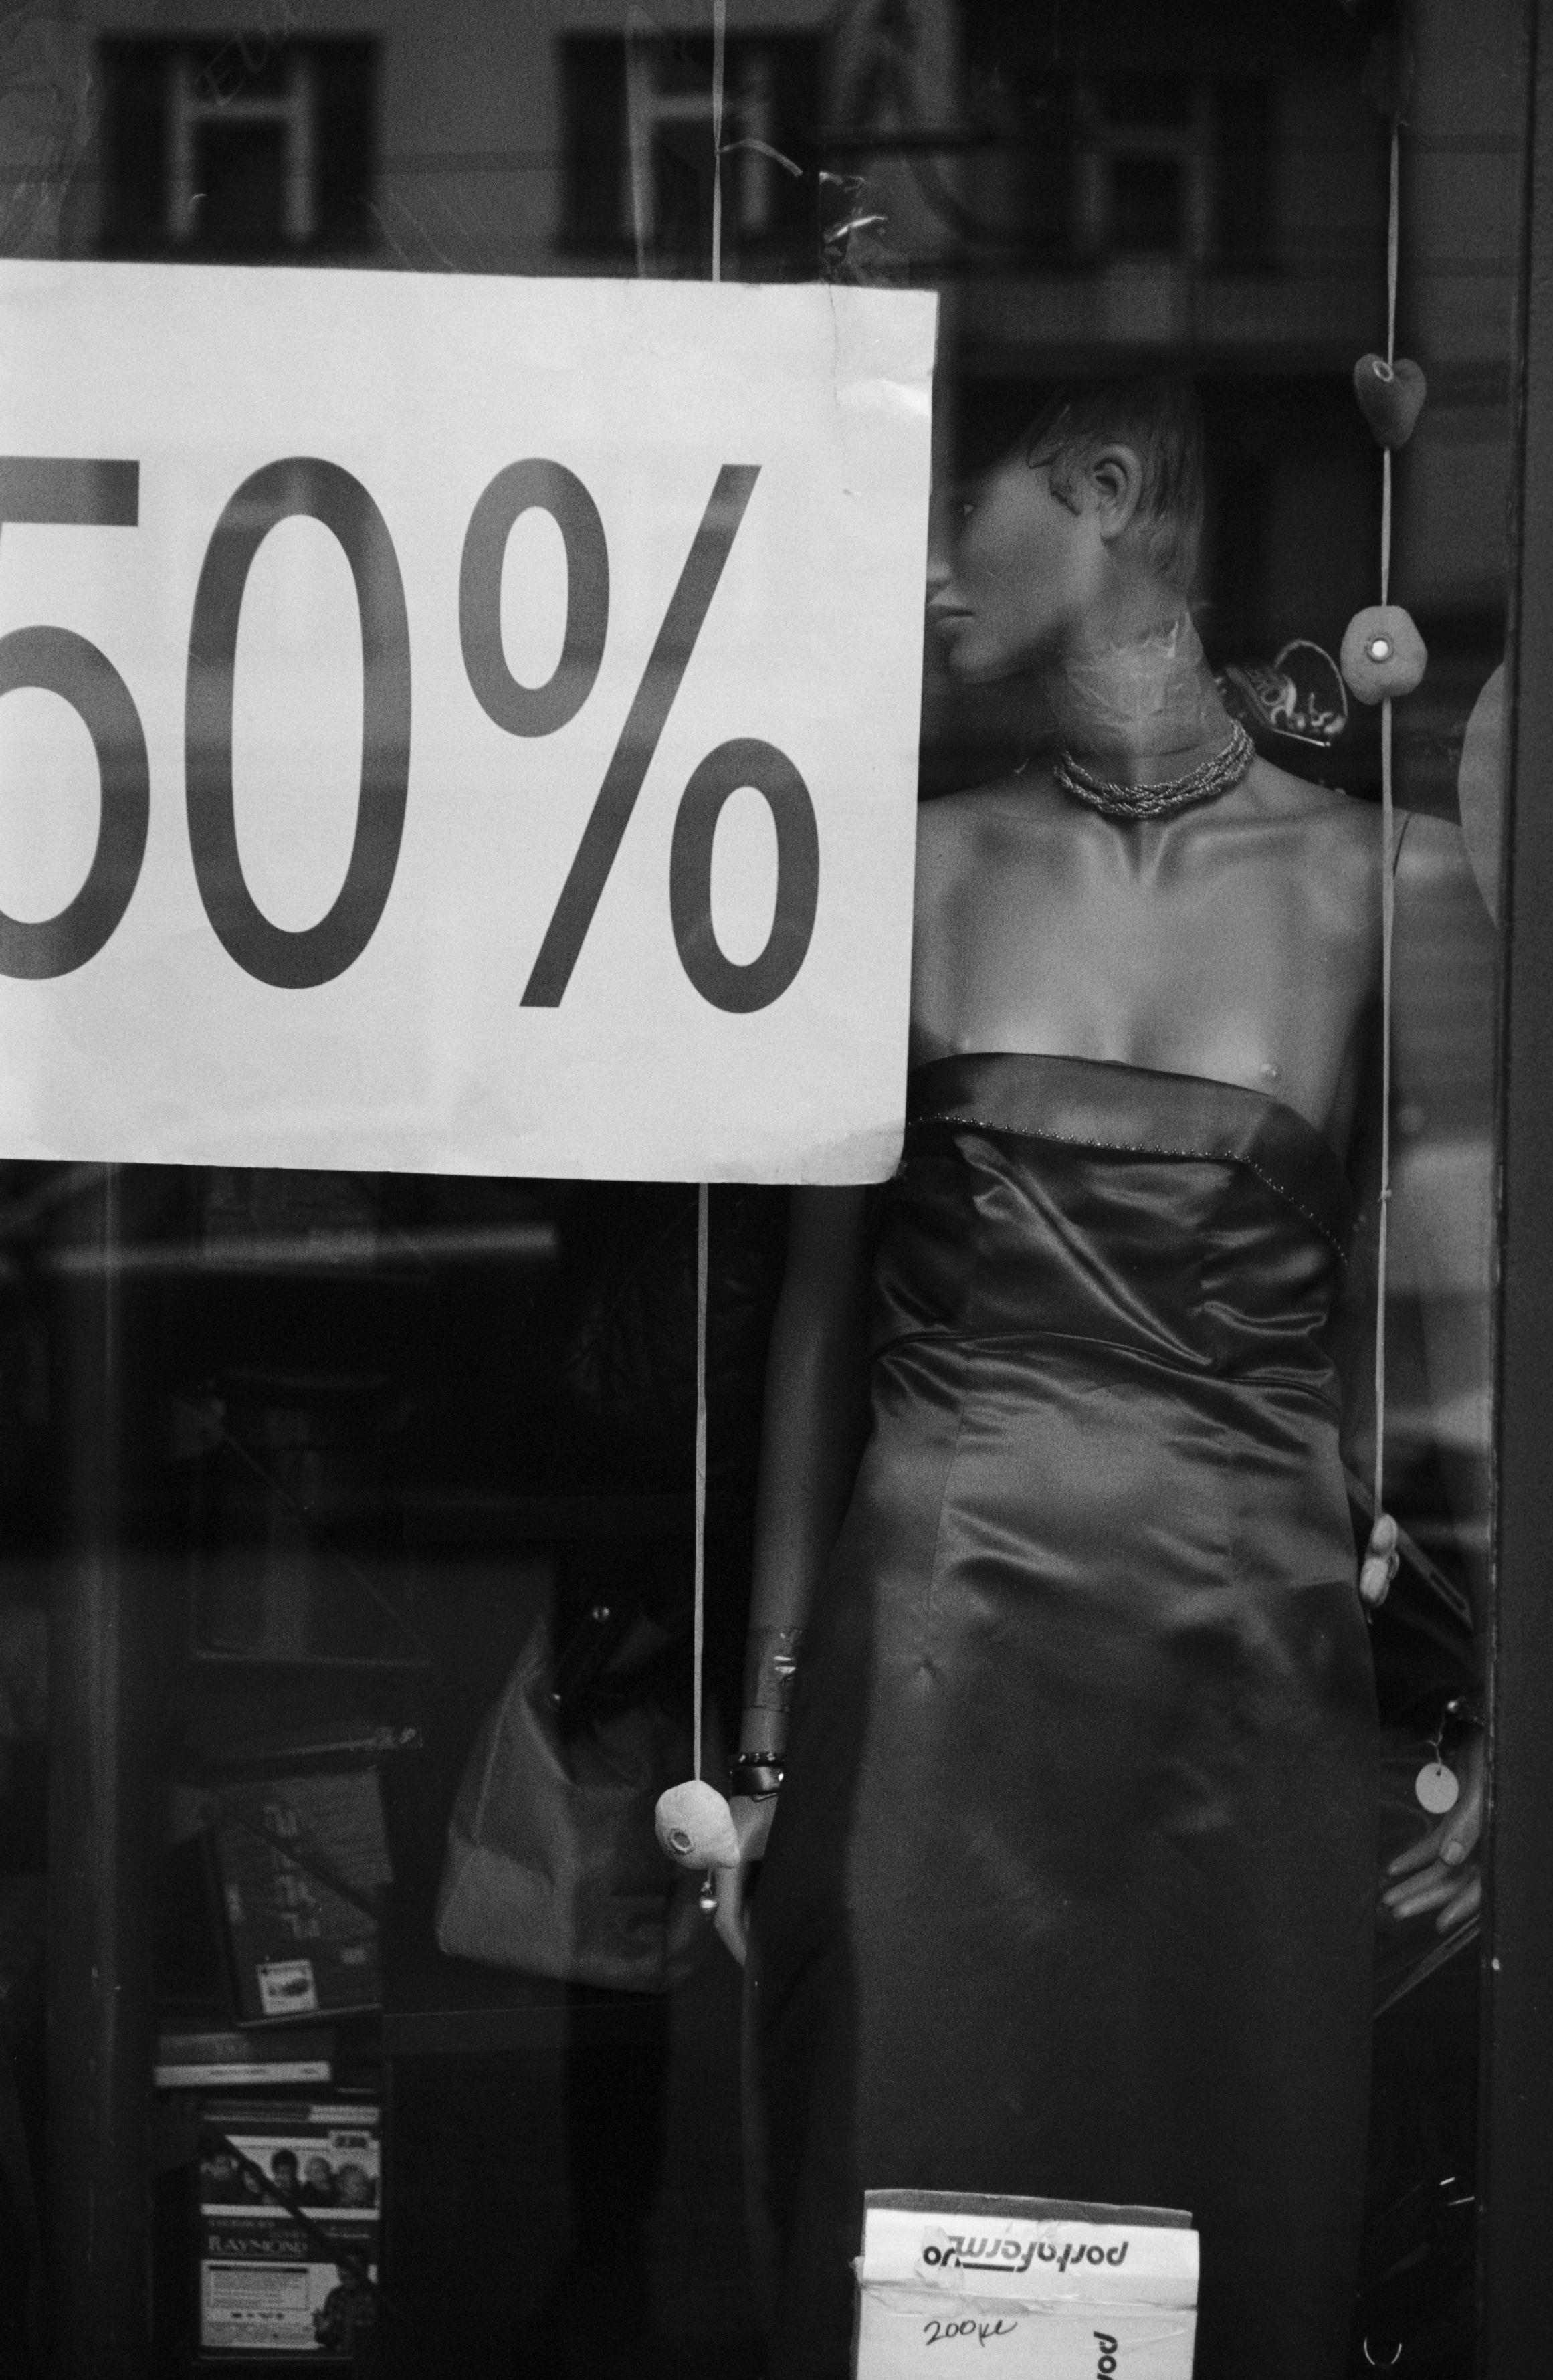 Dress shop, Prague 6